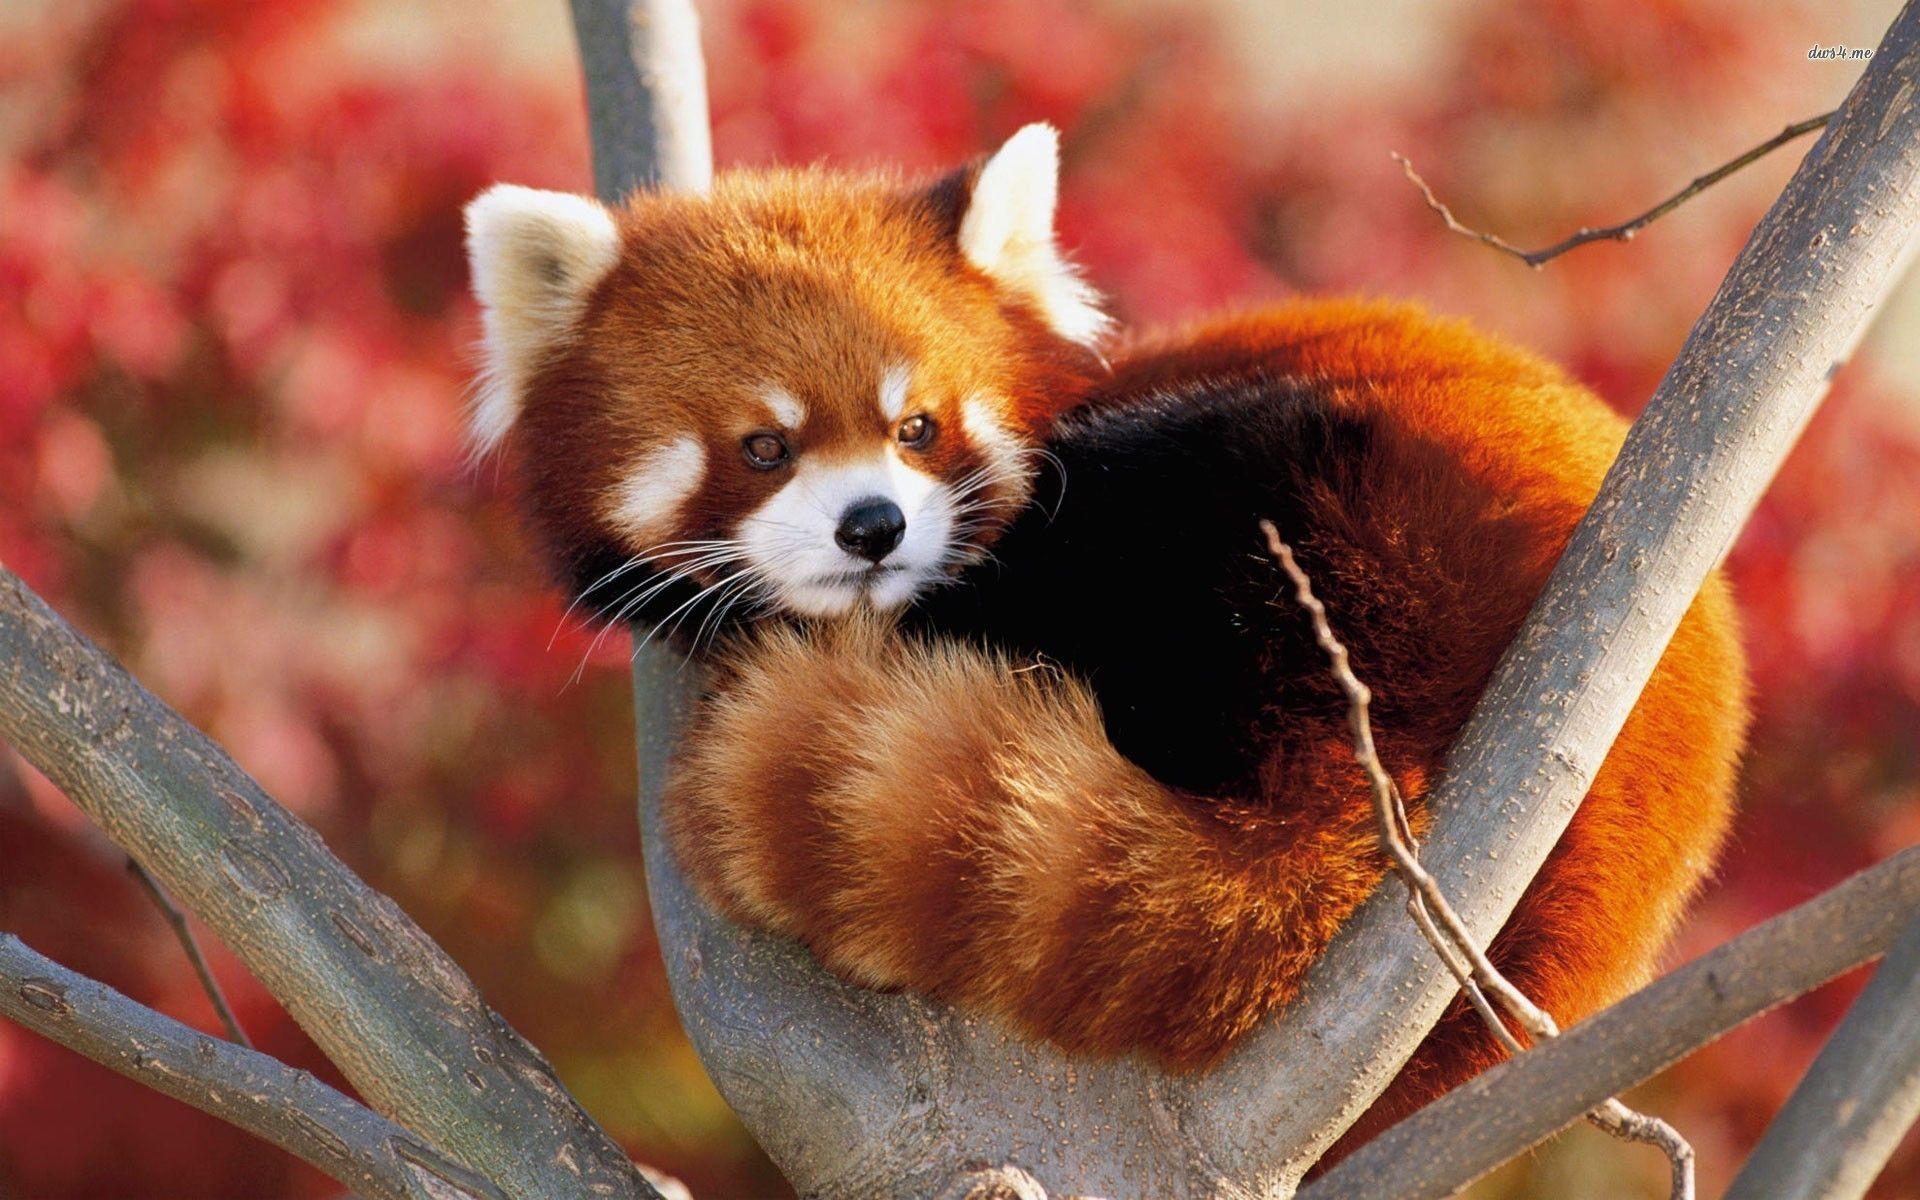 Baby Red Panda Wallpaper Desktop Background With High Definition Wallpaper 1920x1200 Px 329 27 Kb Weird Animals Cute Animals Red Panda